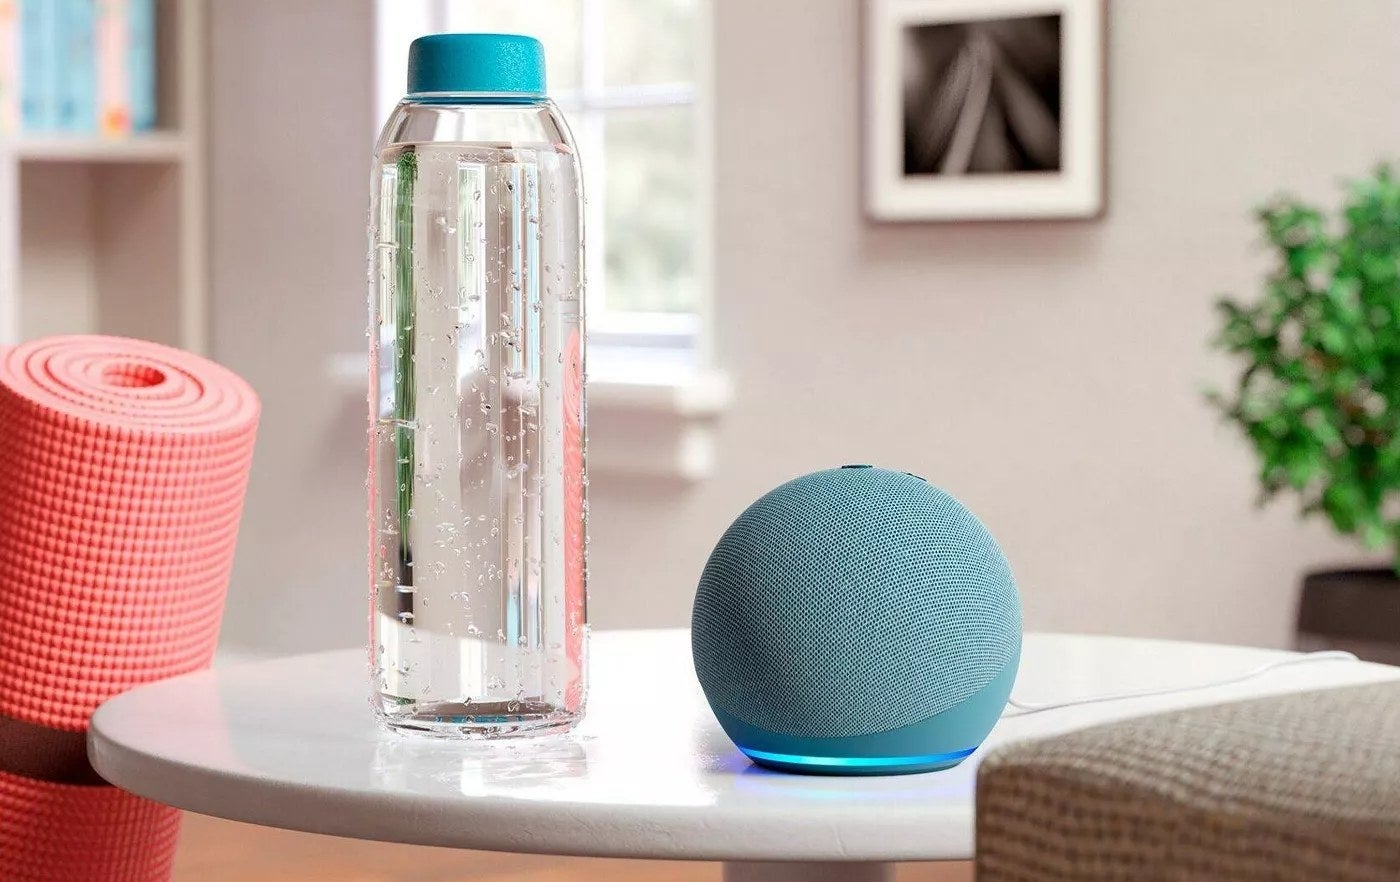 The speaker in blue